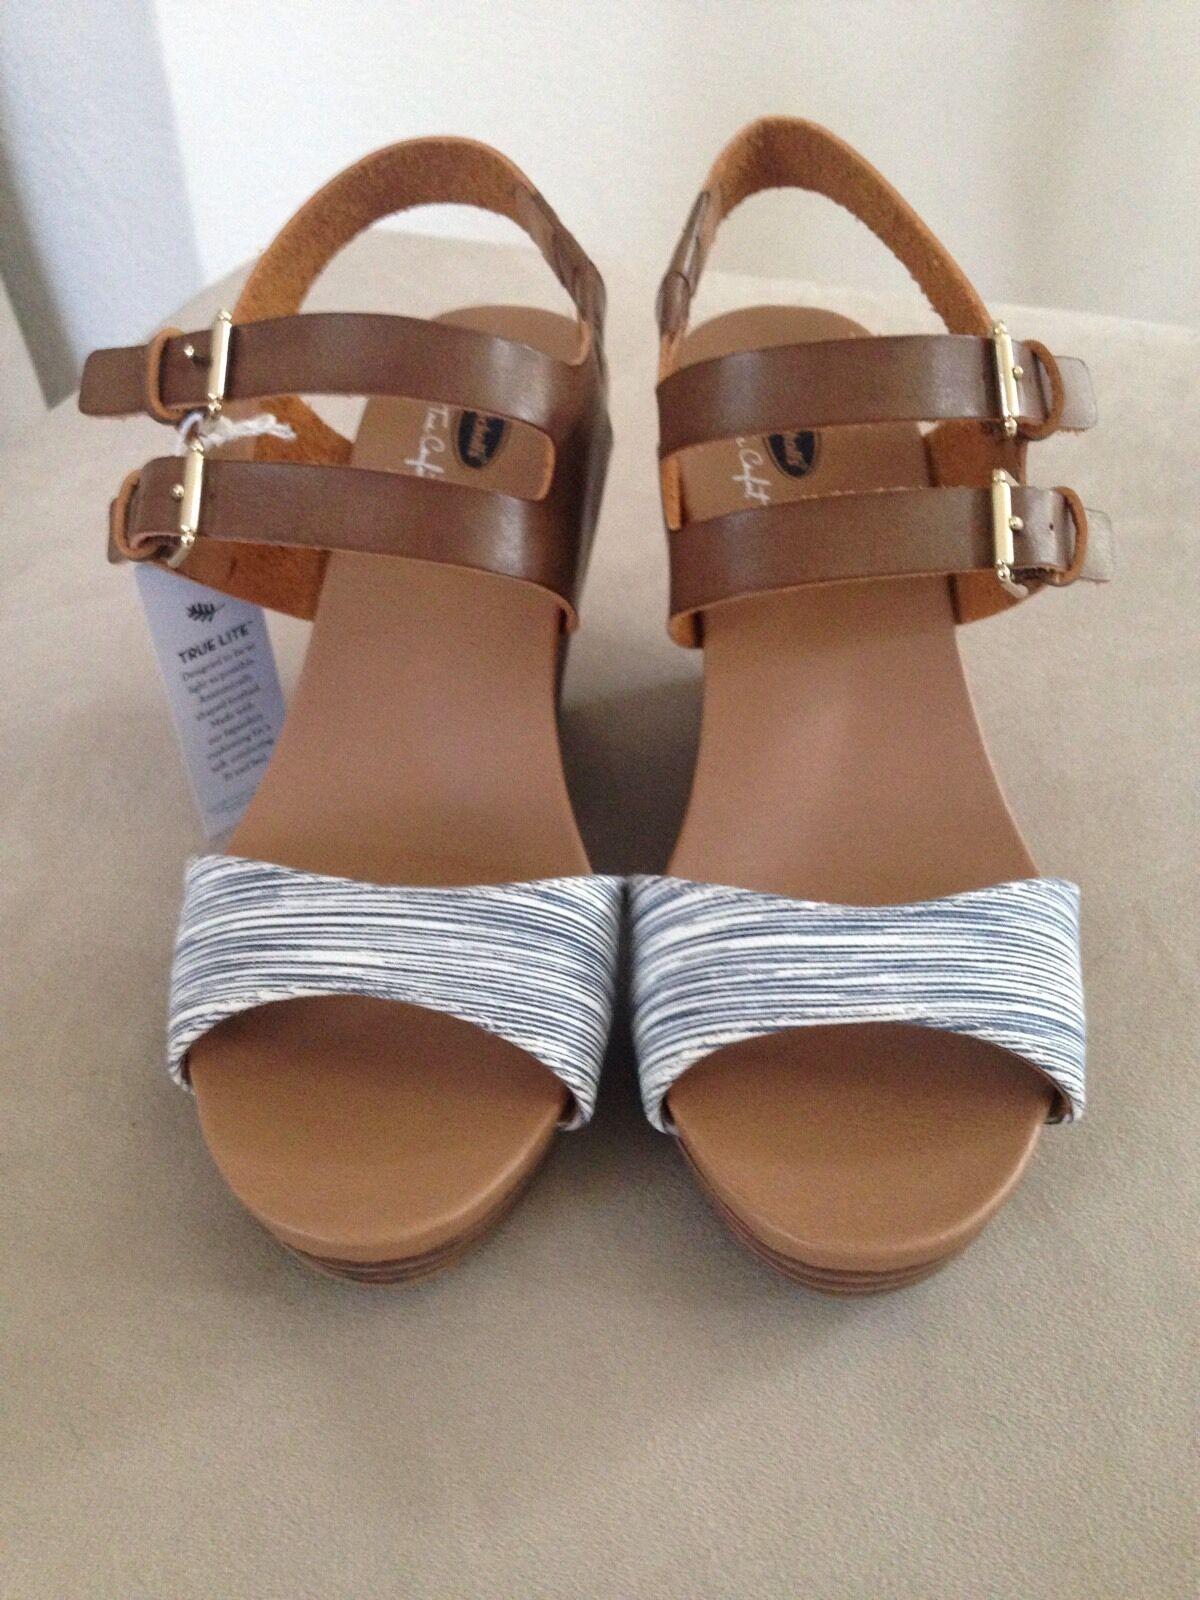 Women's Nurture Shoes Size 8M Blue Leather Ankle Strap S02F4